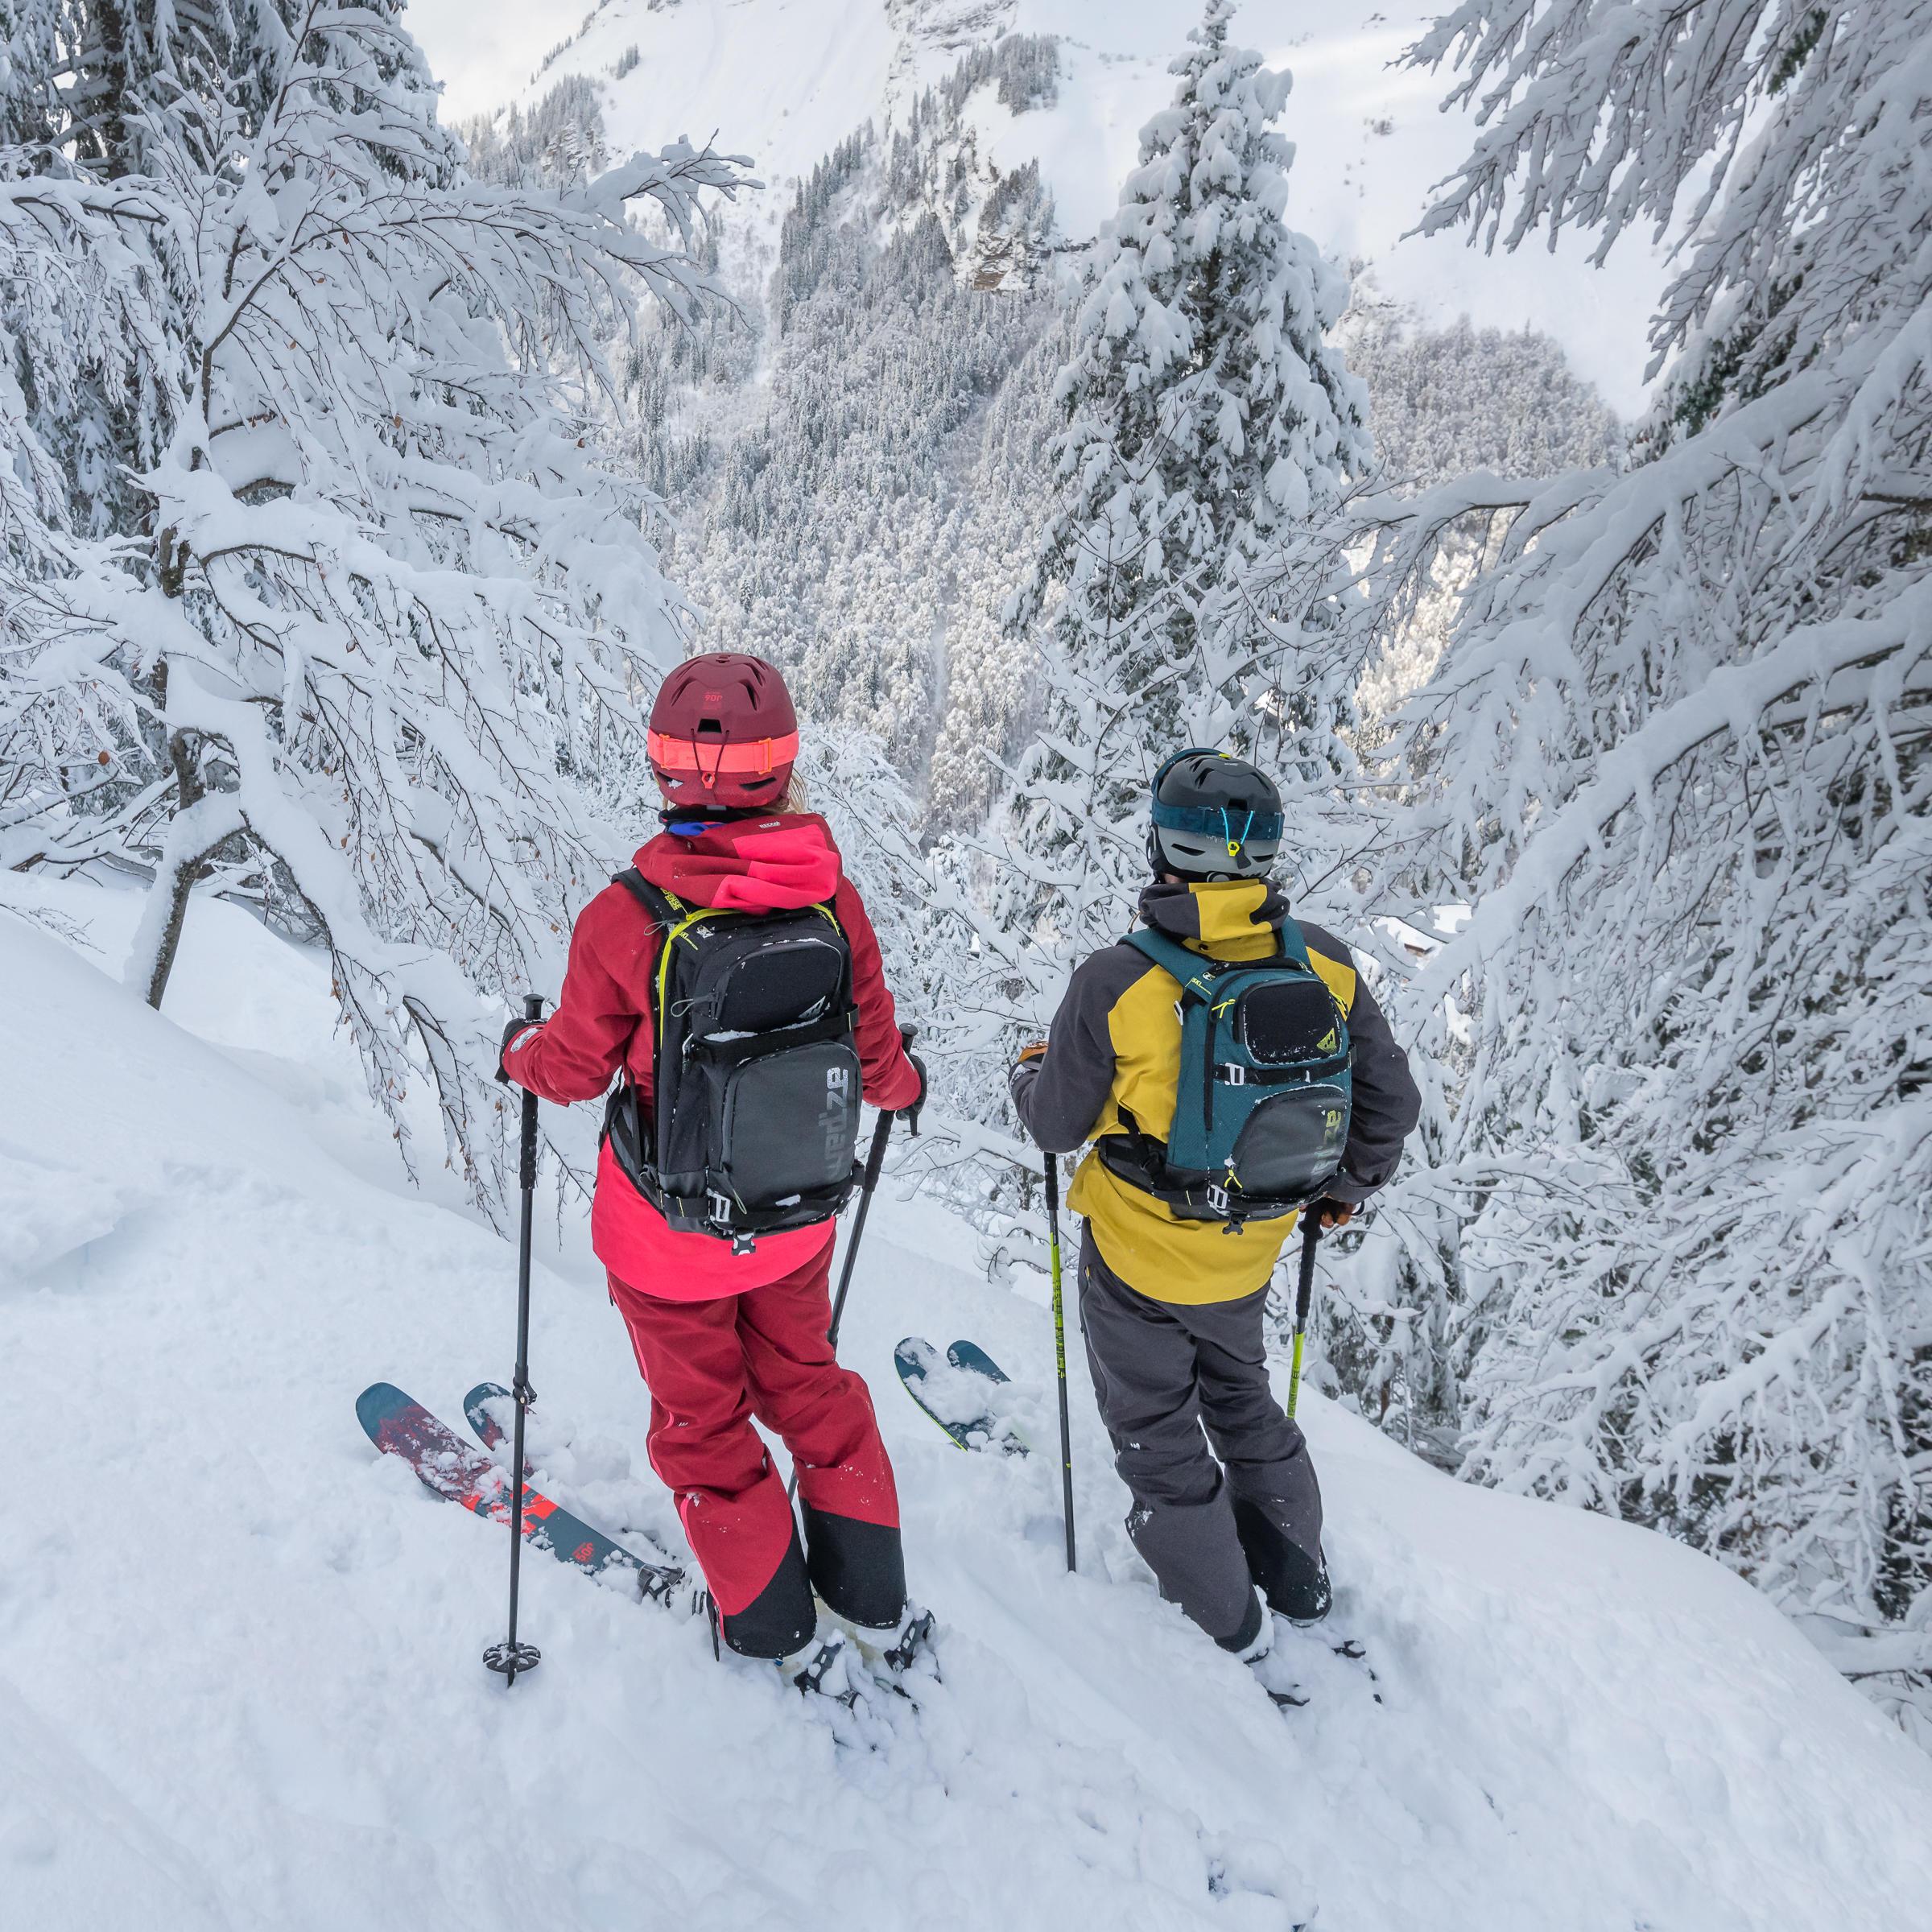 ski freeride expert